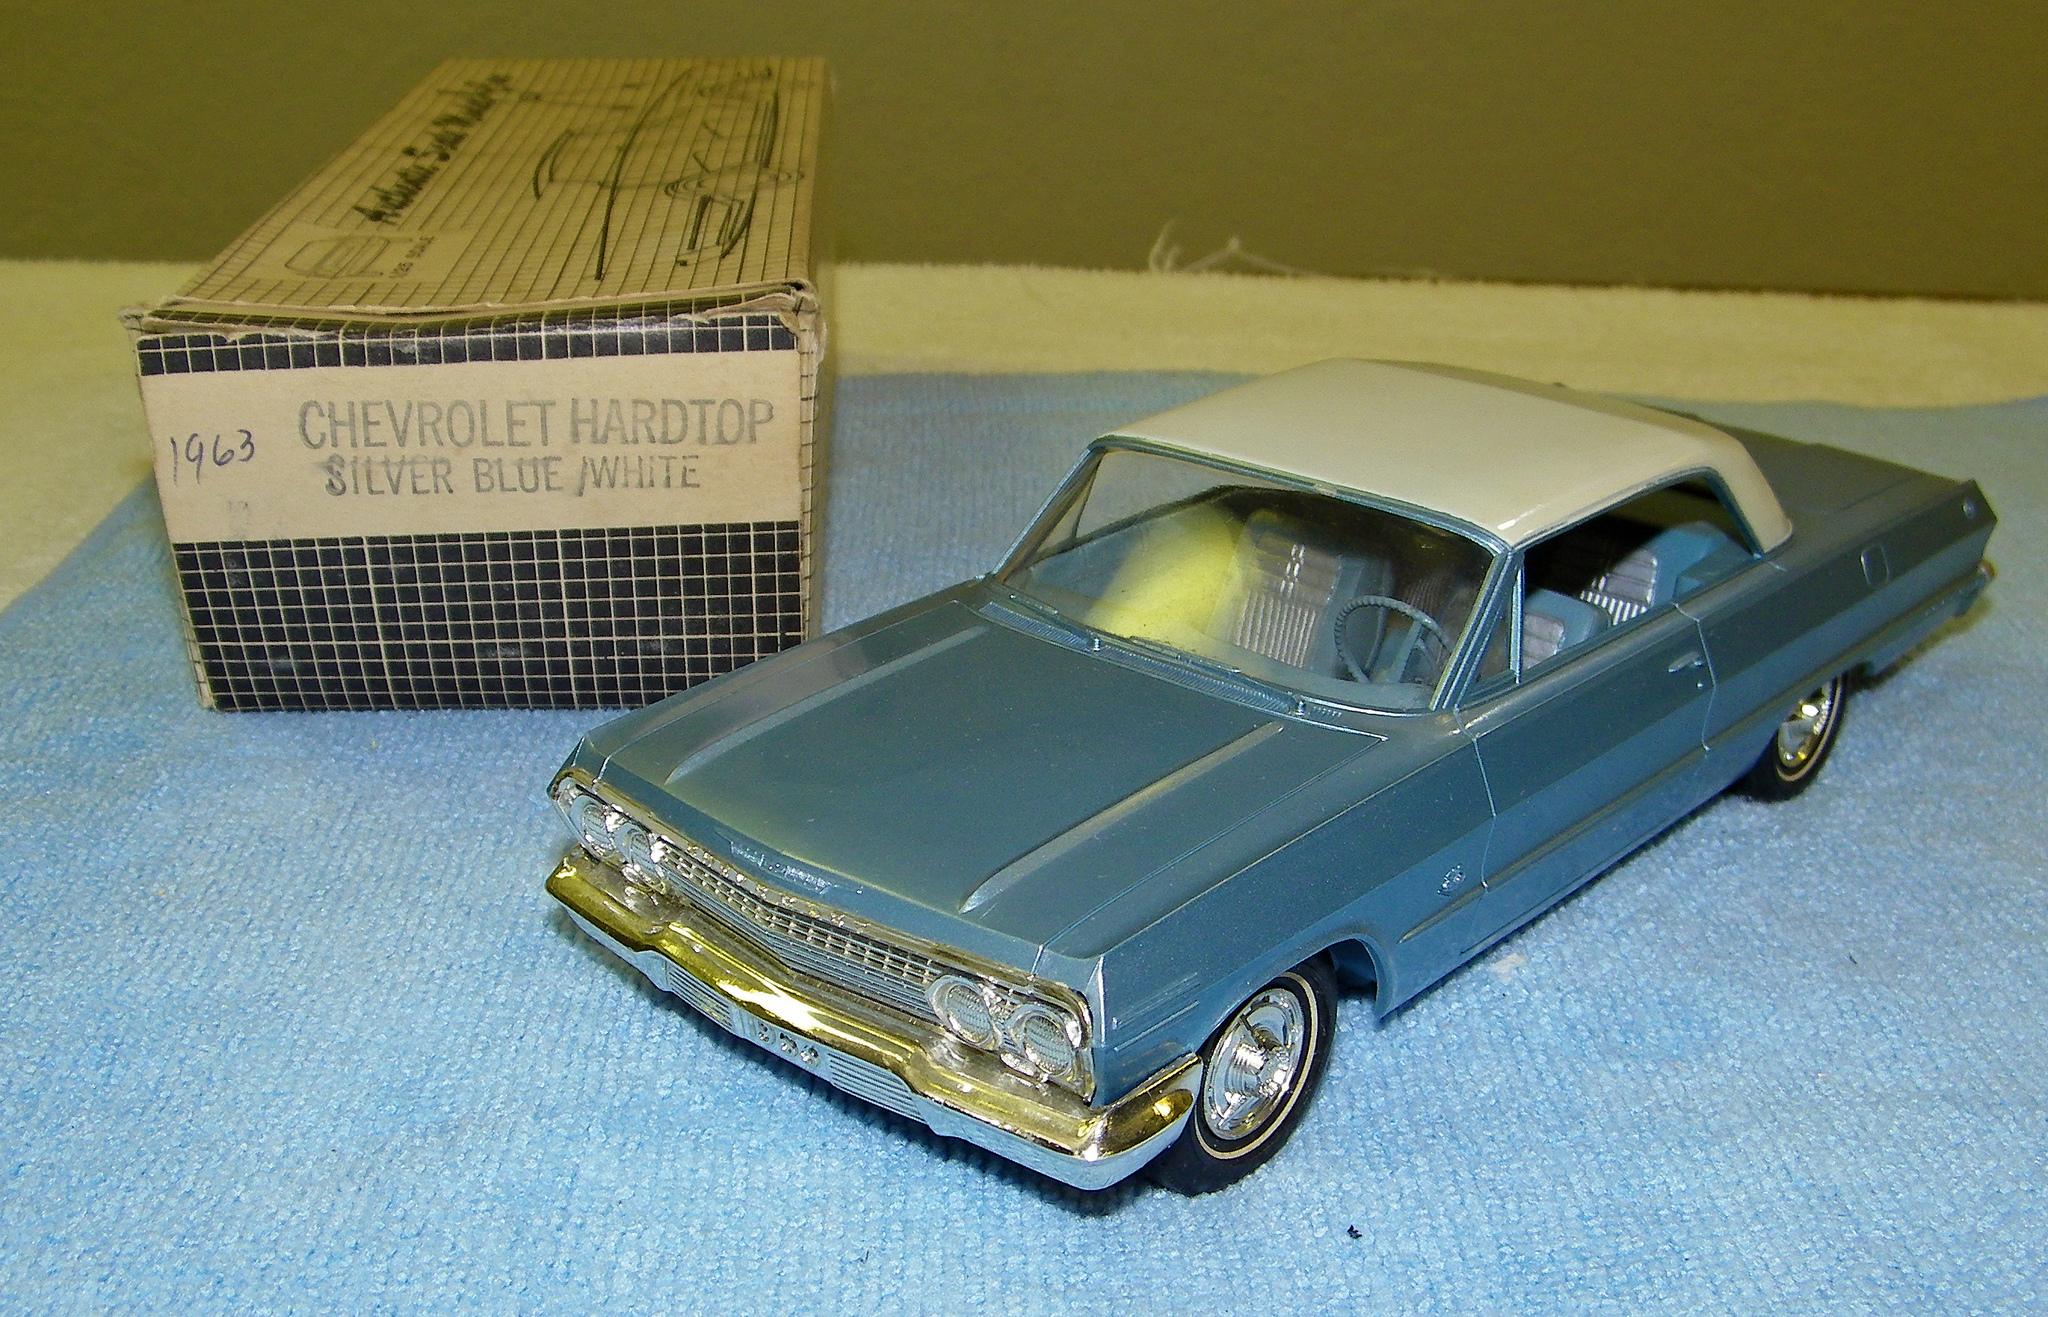 2 Door Charger >> 1963 Chevrolet Impala Super Sport Hardtop Promo Model Car ...